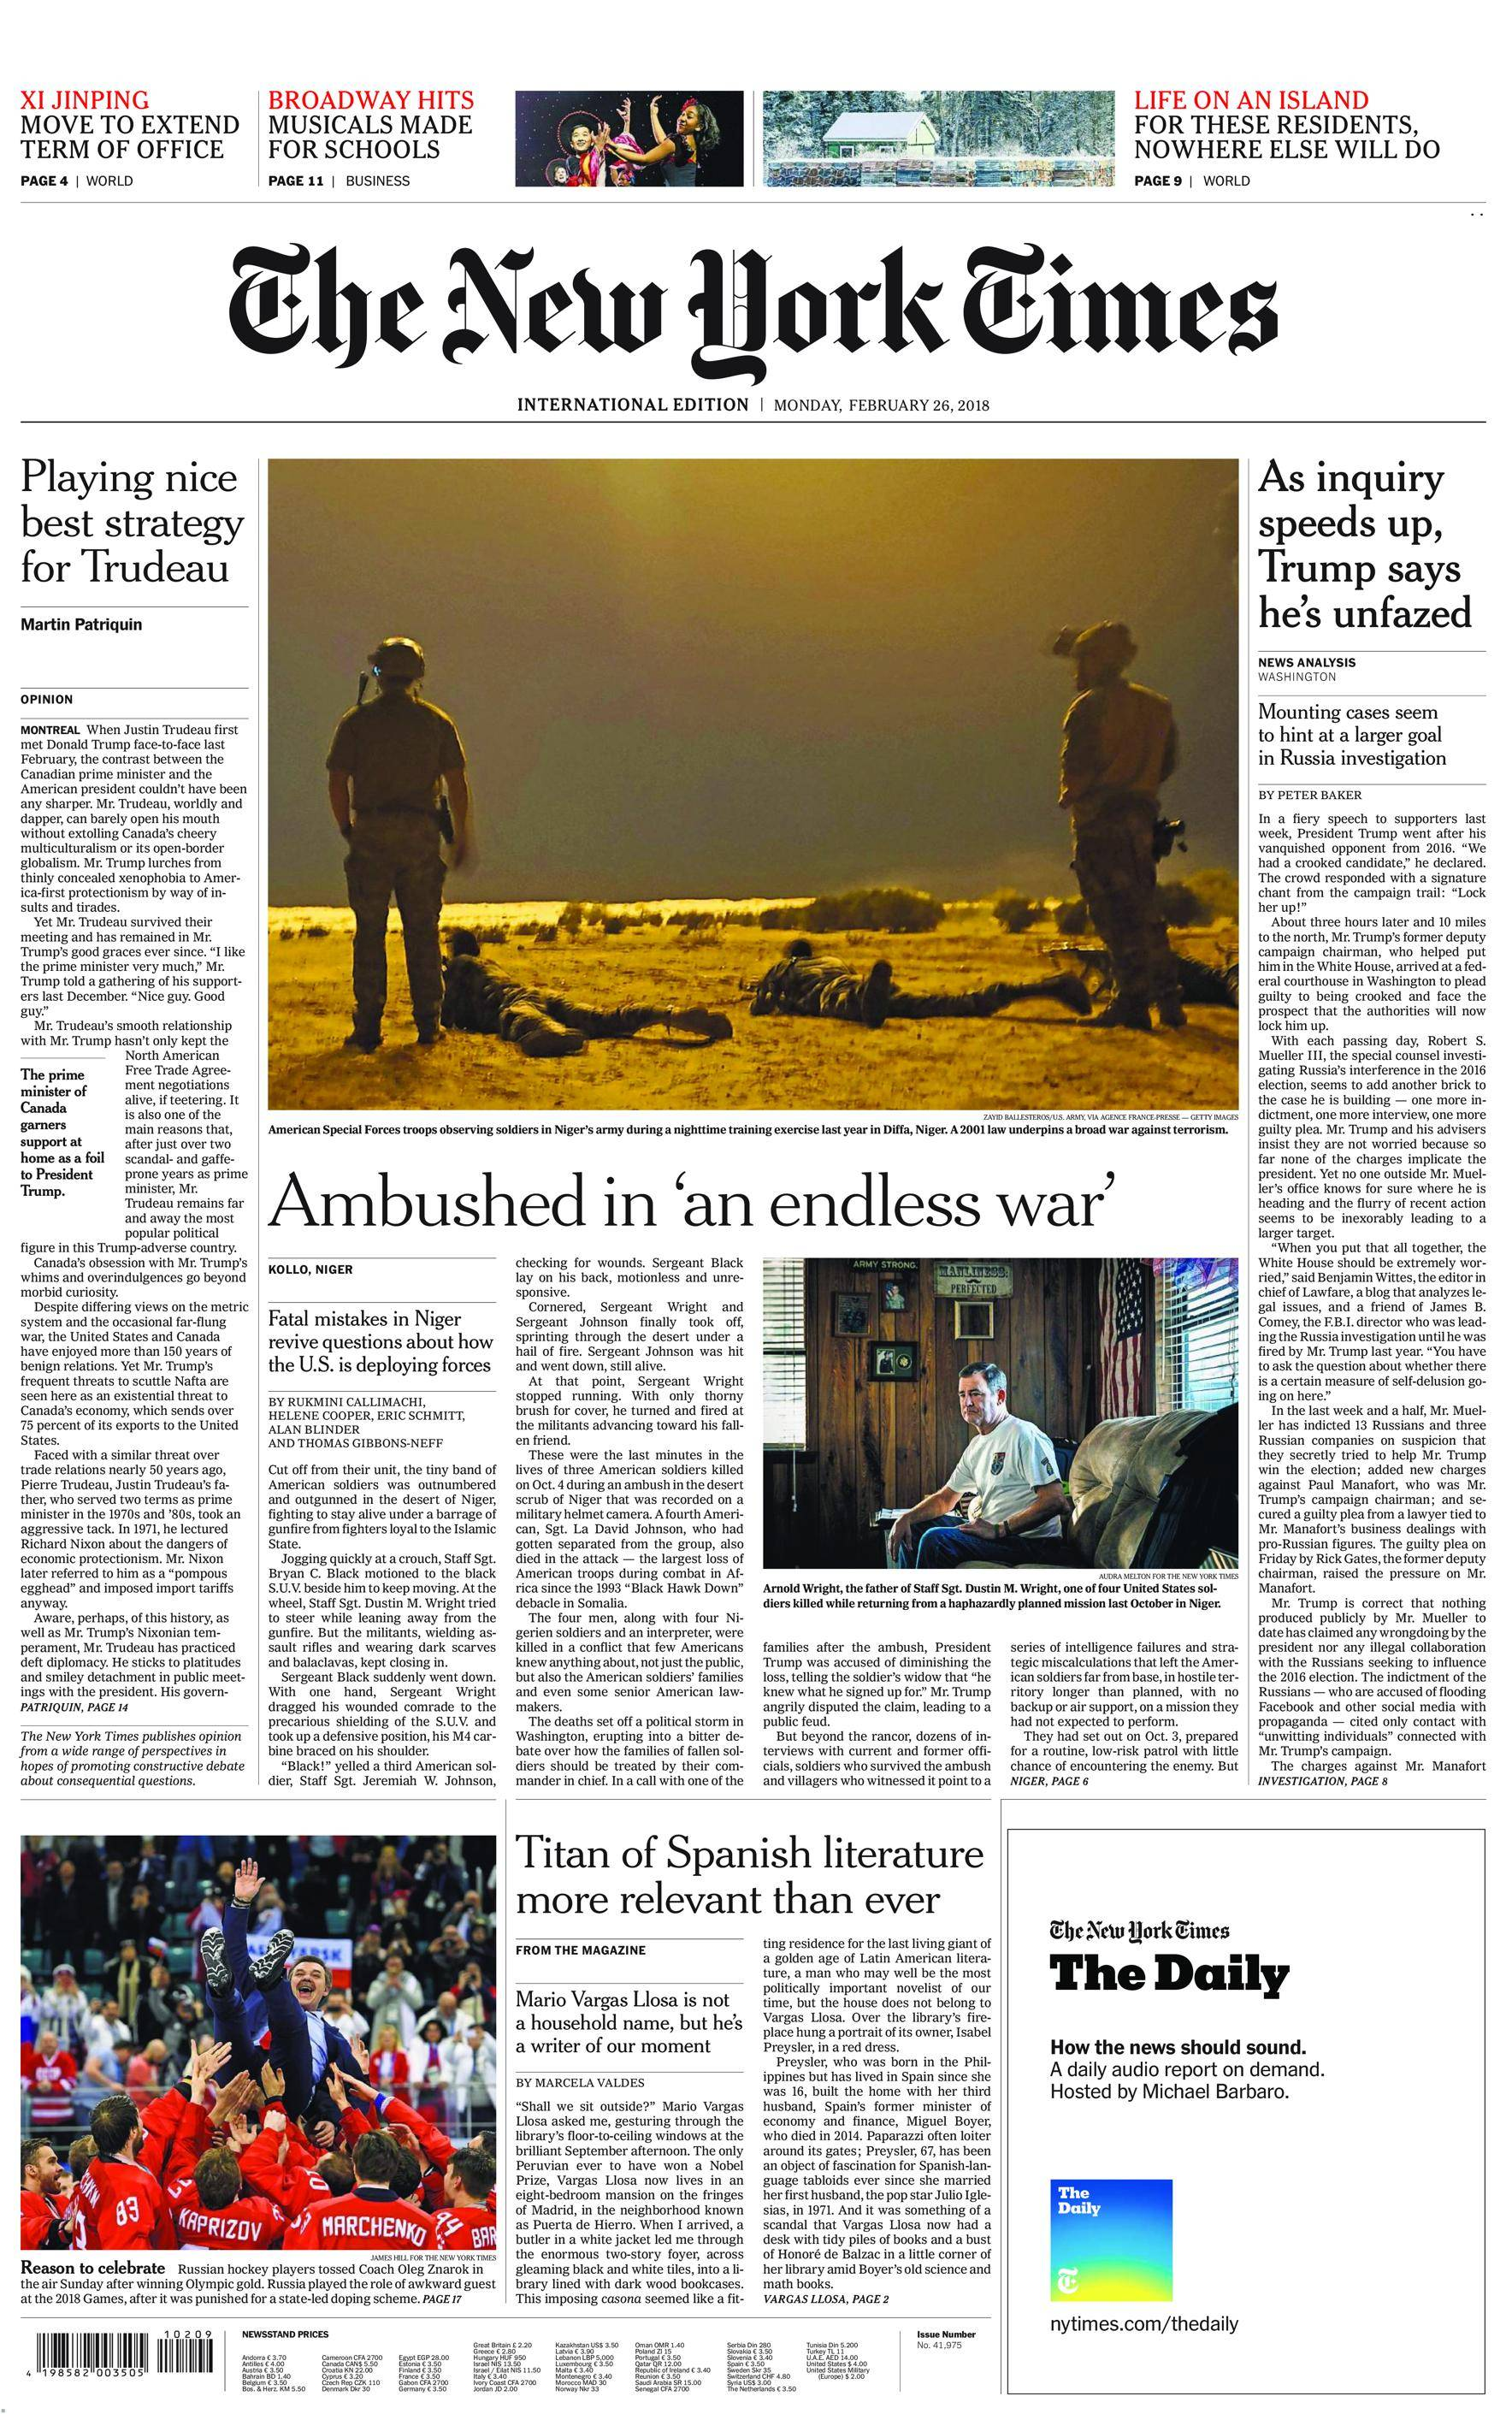 International New York Times - 26 February 2018